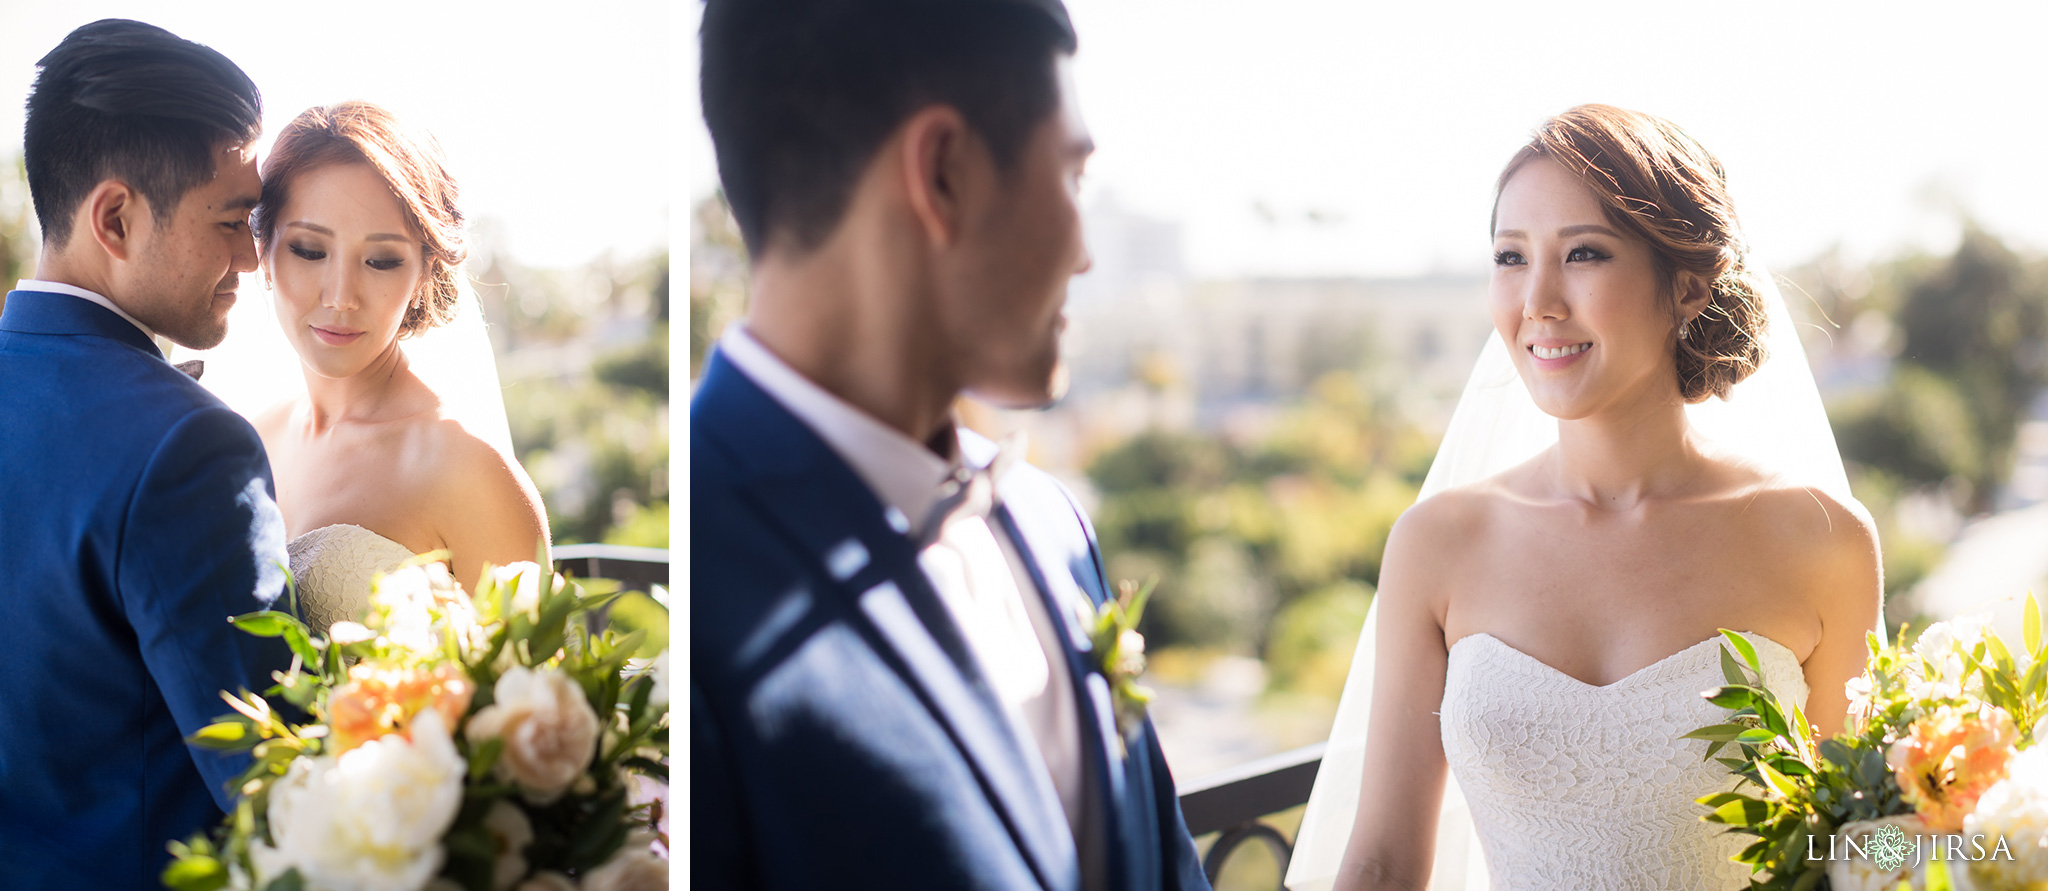 16 The London West Hollywood Wedding Photography